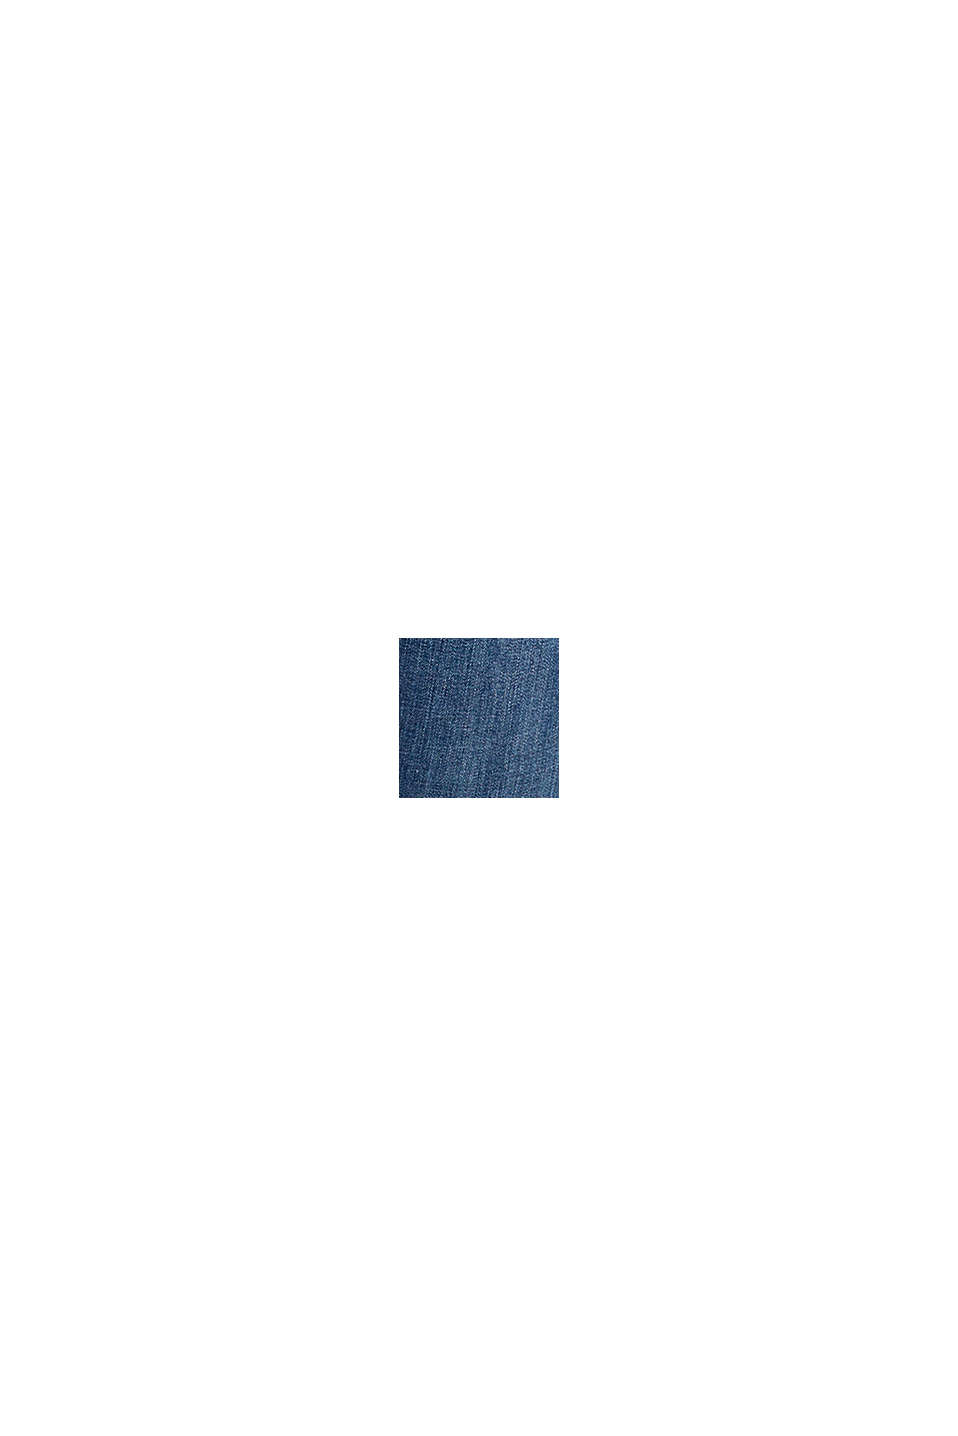 Av ekologisk bomull: jeans med skärp, BLUE DARK WASHED, swatch